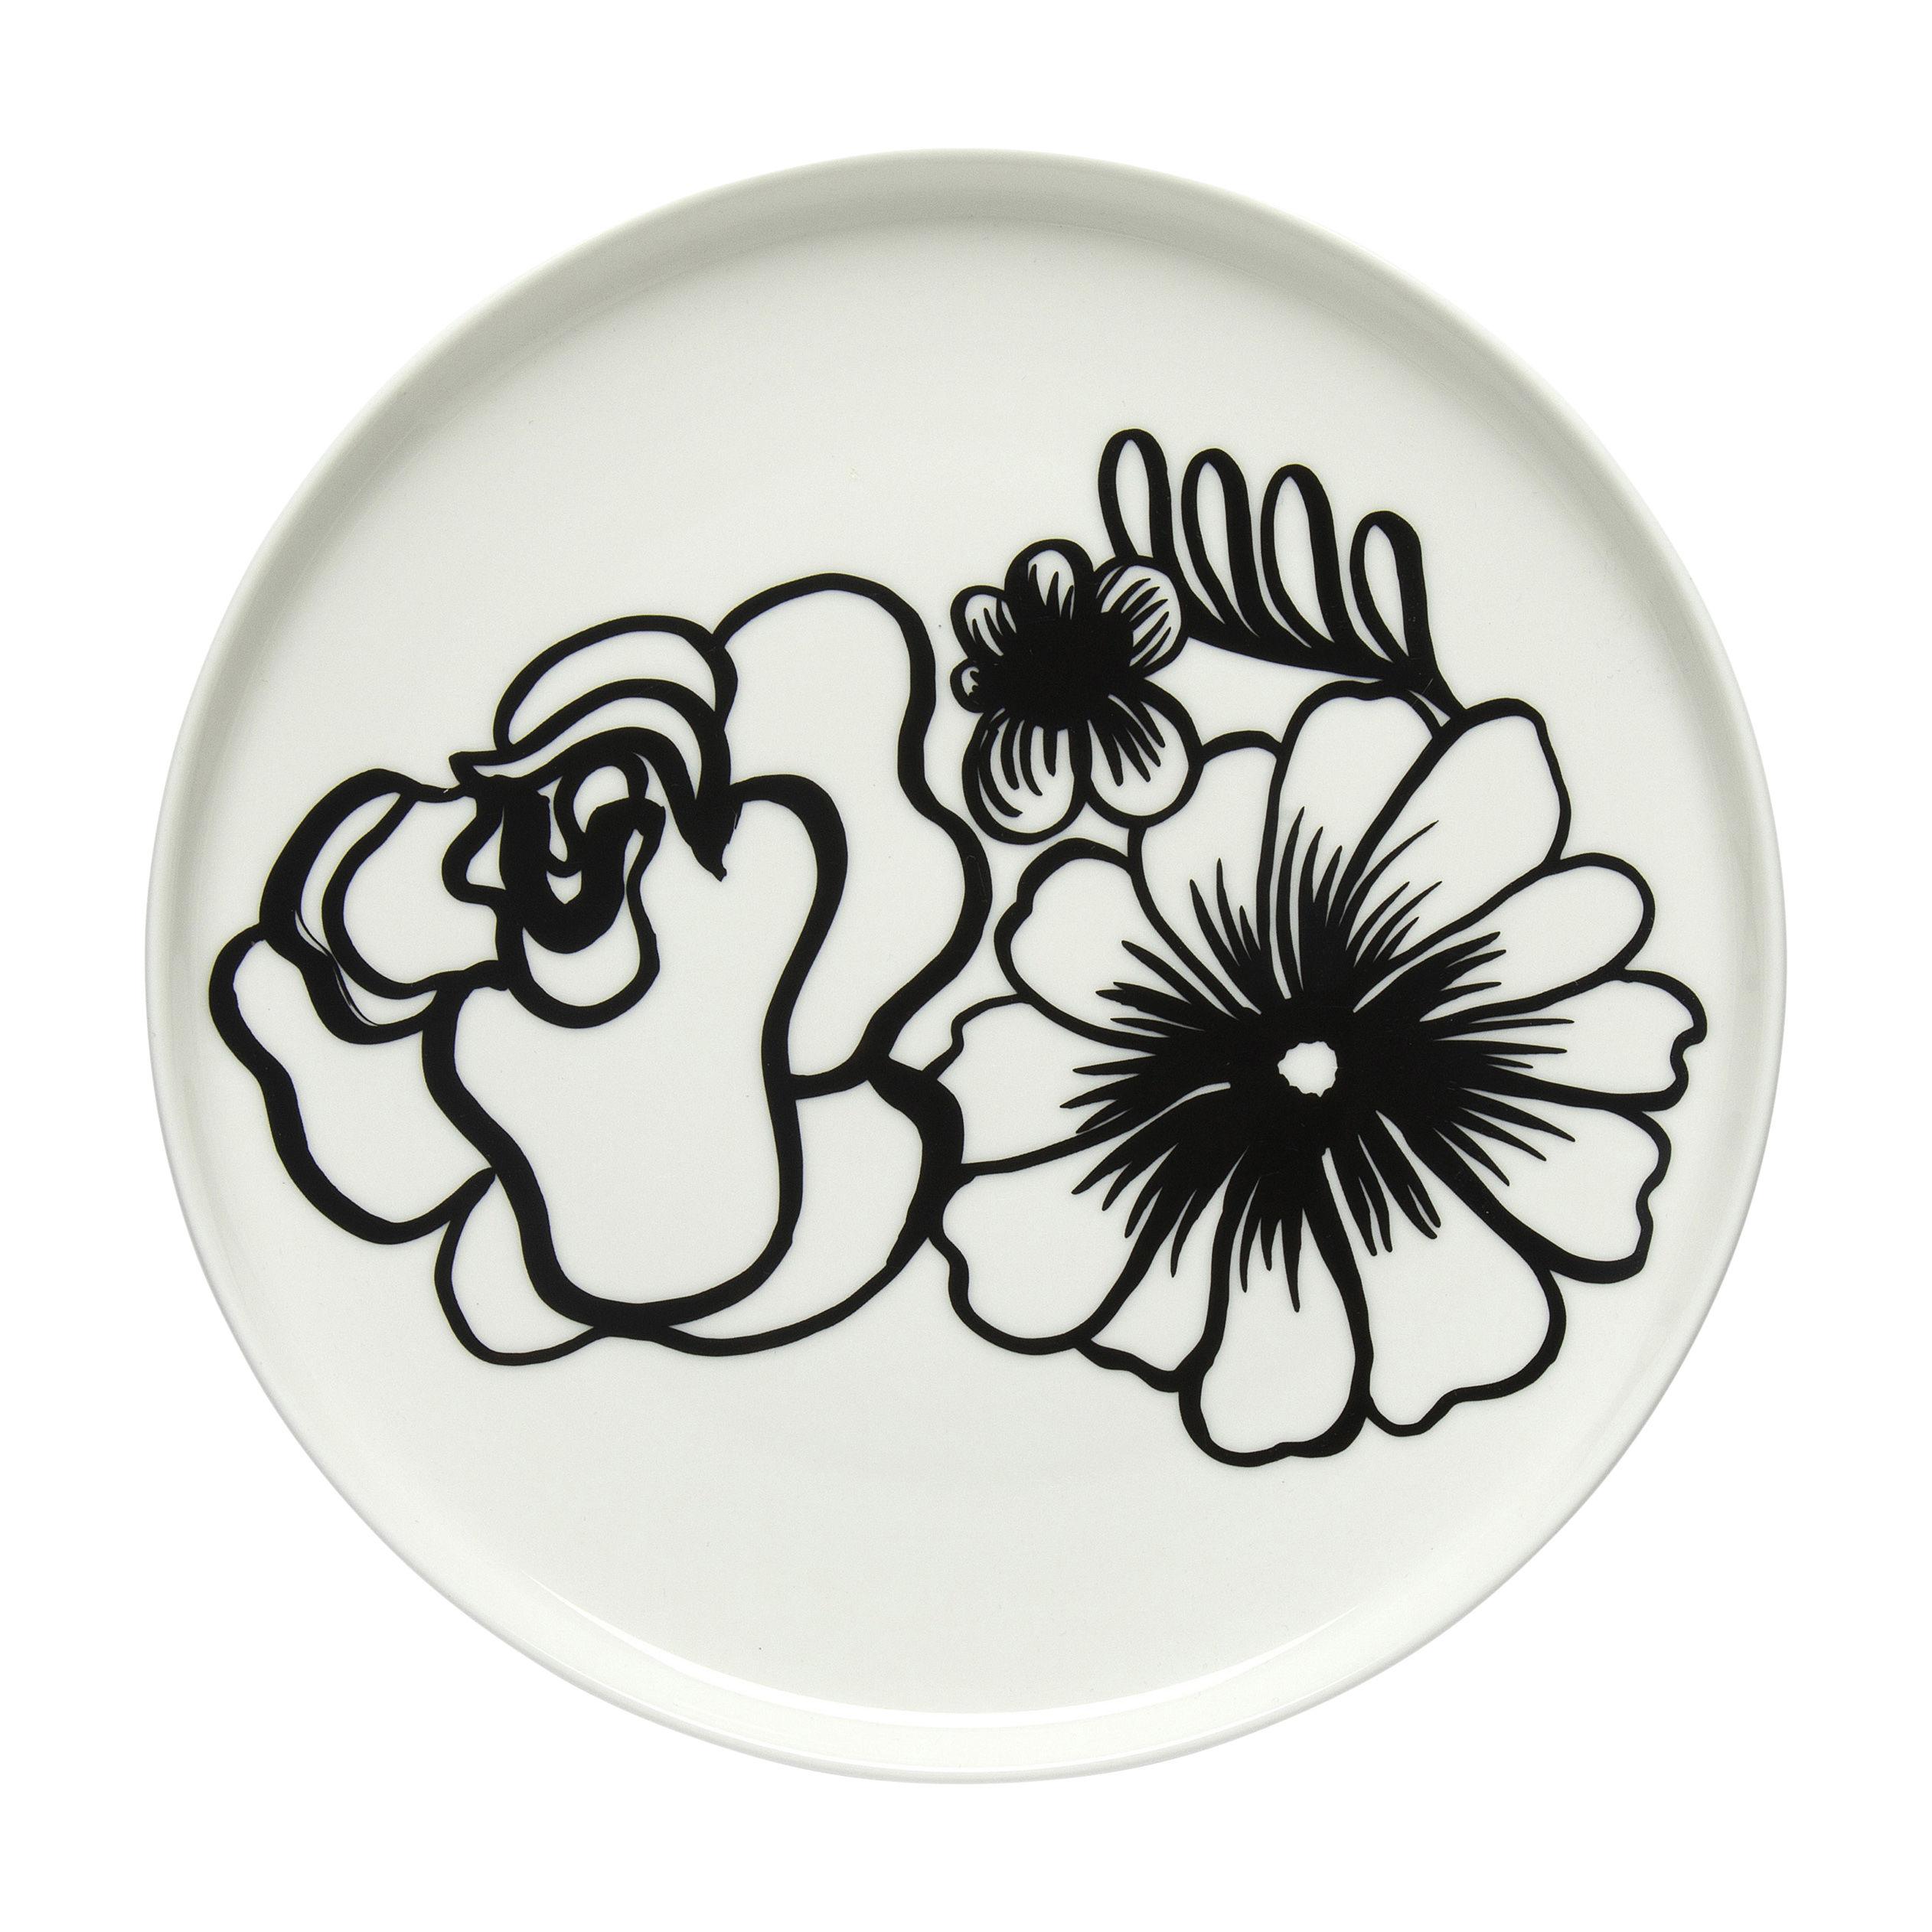 Tableware - Plates - Eläköön Elämä Dessert plate - / Ø 20 cm by Marimekko - Eläköön Elämä / Black & white - Sandstone